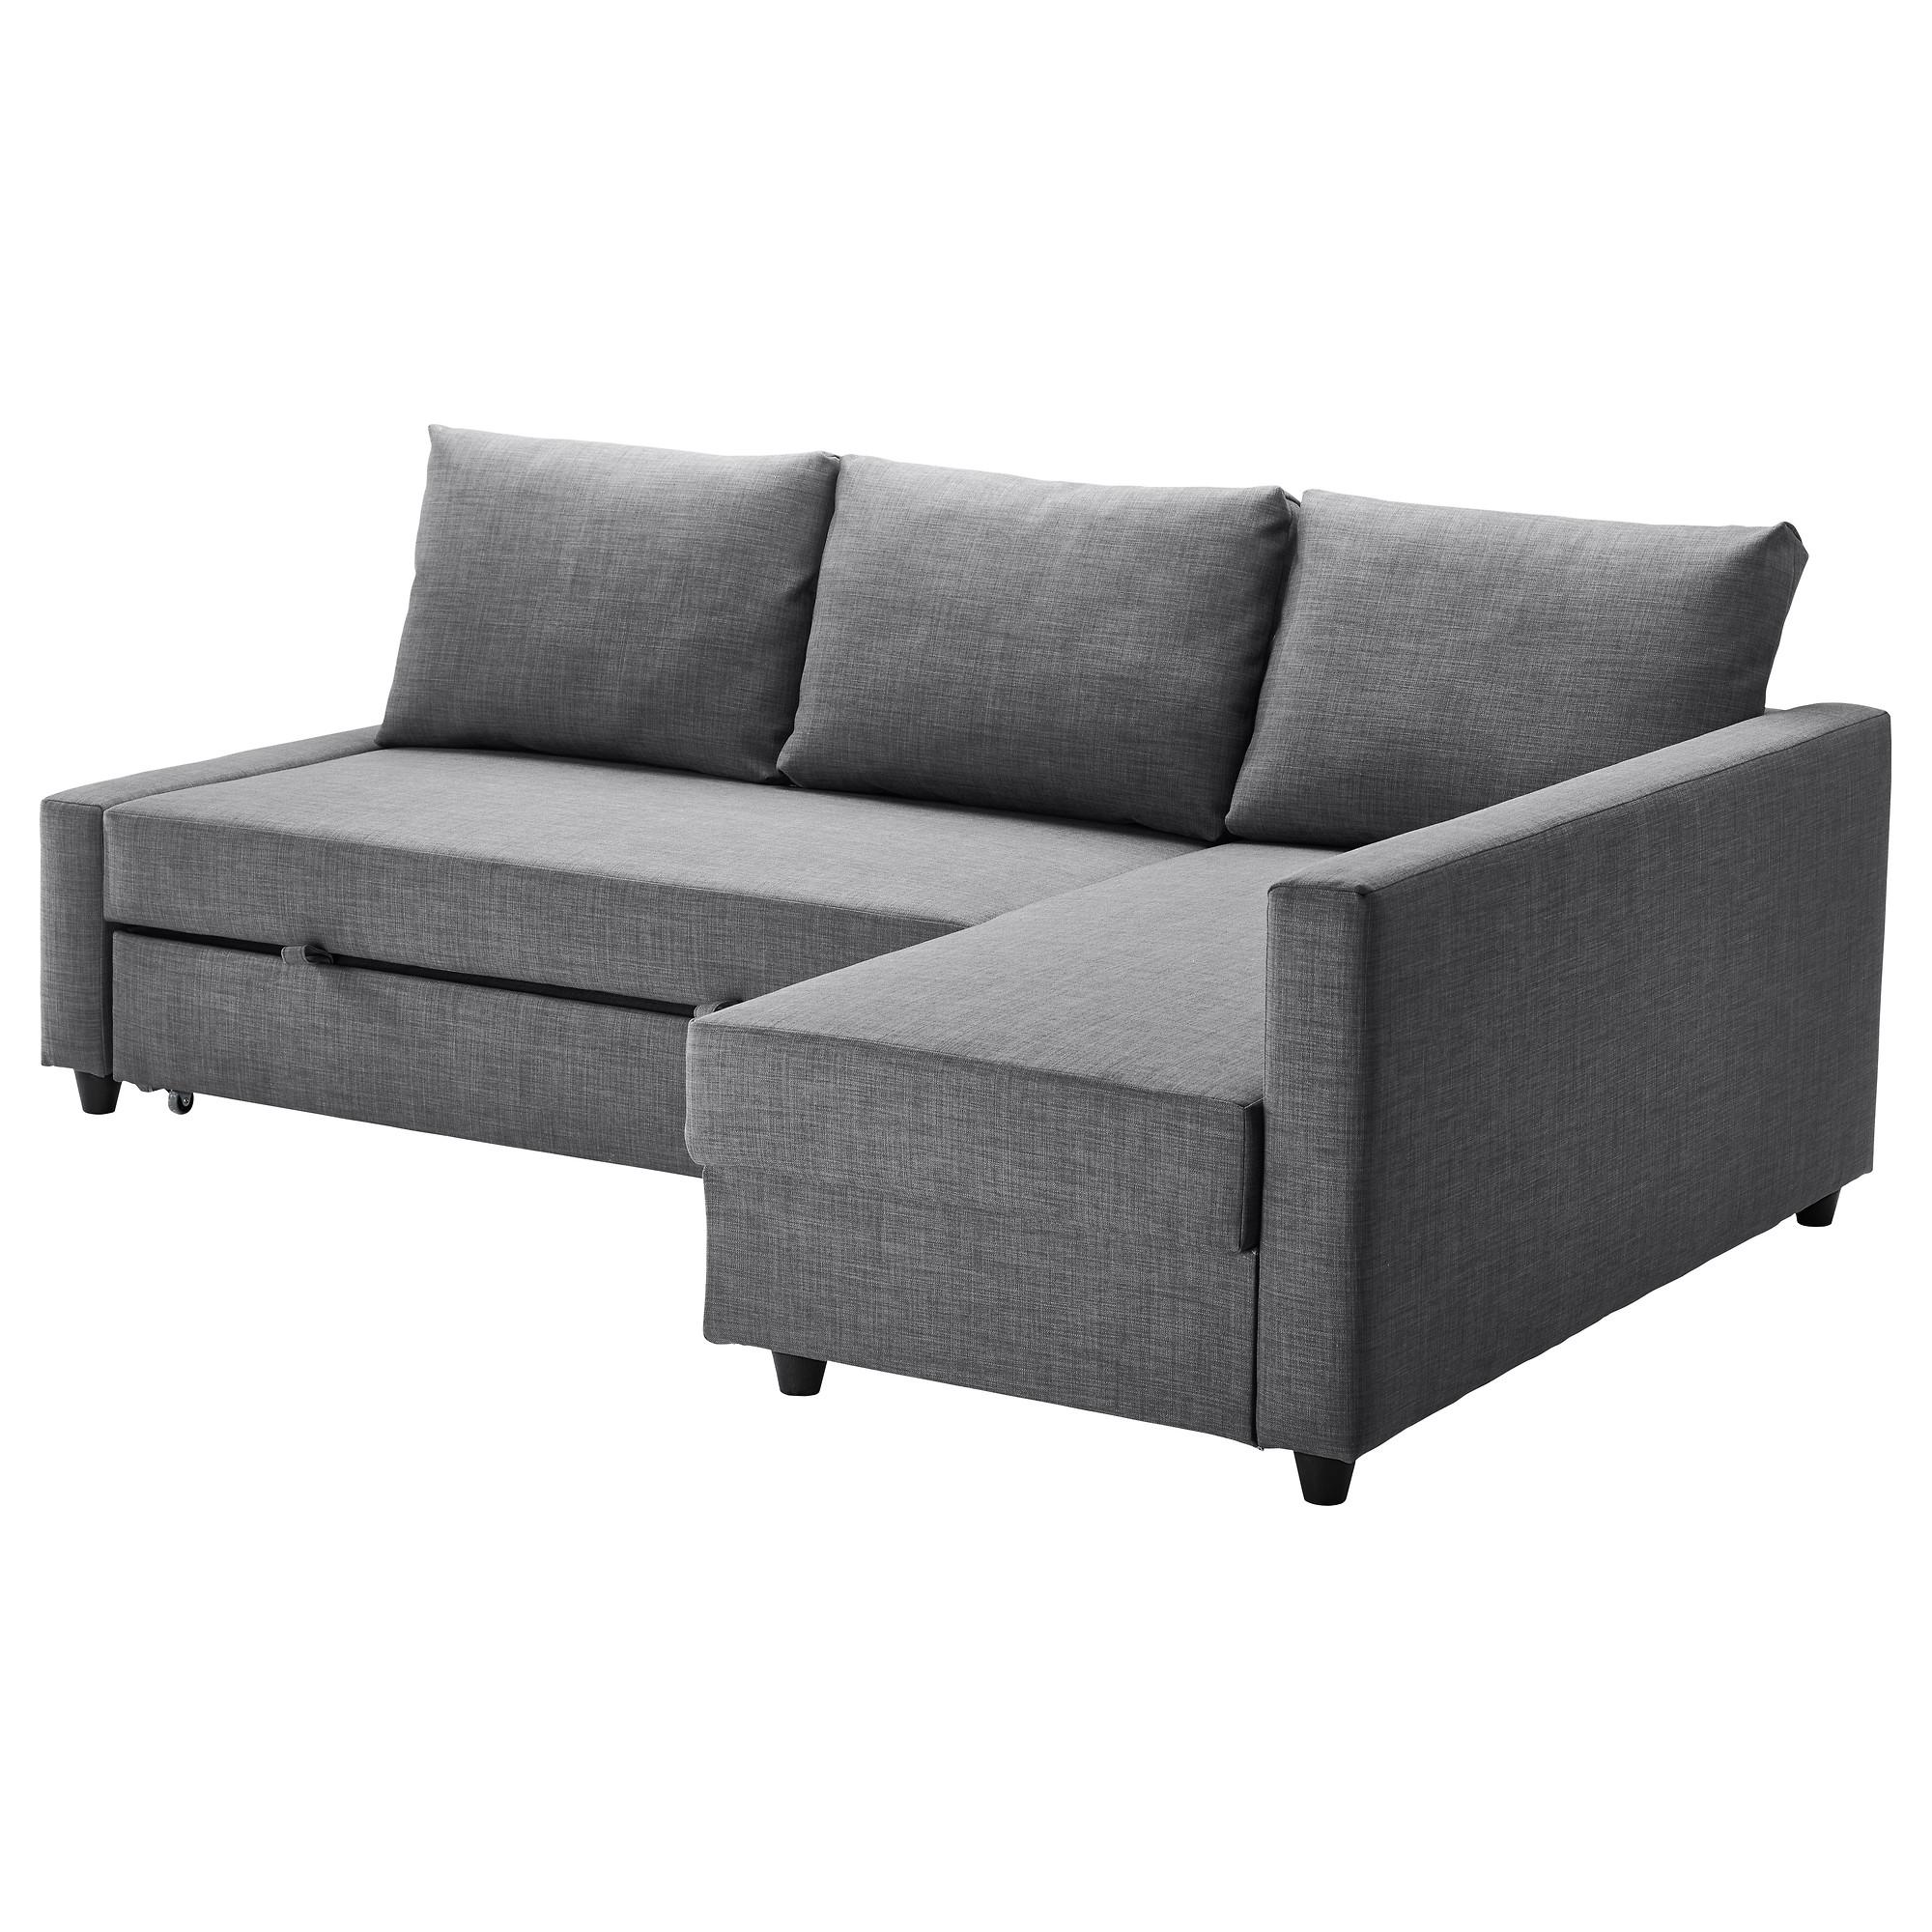 sofa sleeper friheten sleeper sectional,3 seat w/storage - skiftebo dark gray - ikea EQIZMMA